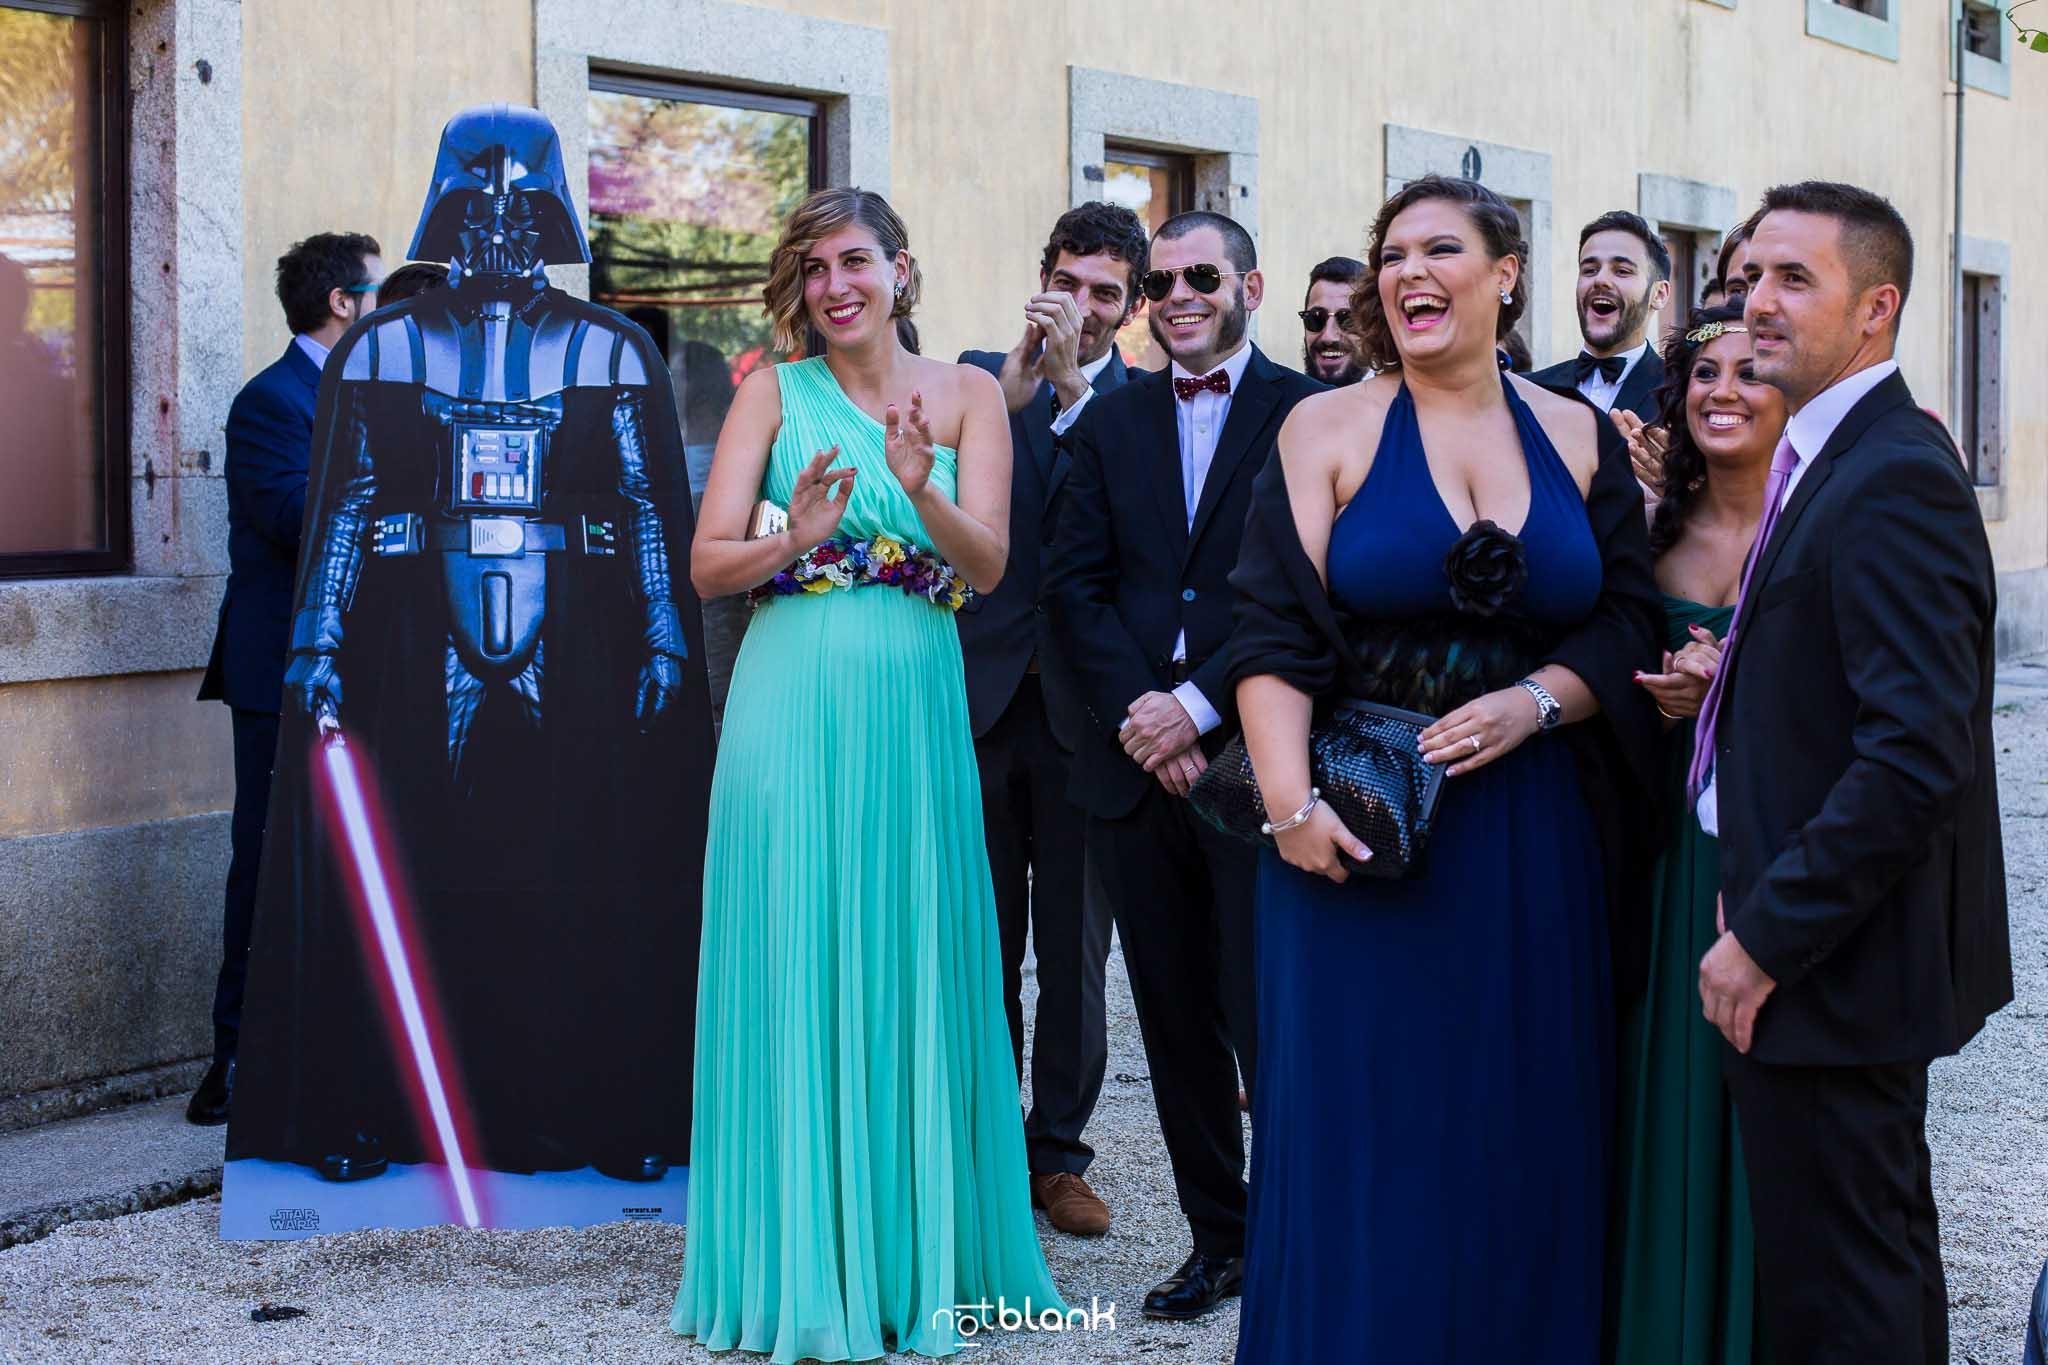 Notblank-Boda Tematica-Star Wars-Malaposta-Portugal-Fotógrafo de boda-Darth Vader-Invitados-Emoción-Sonrisa